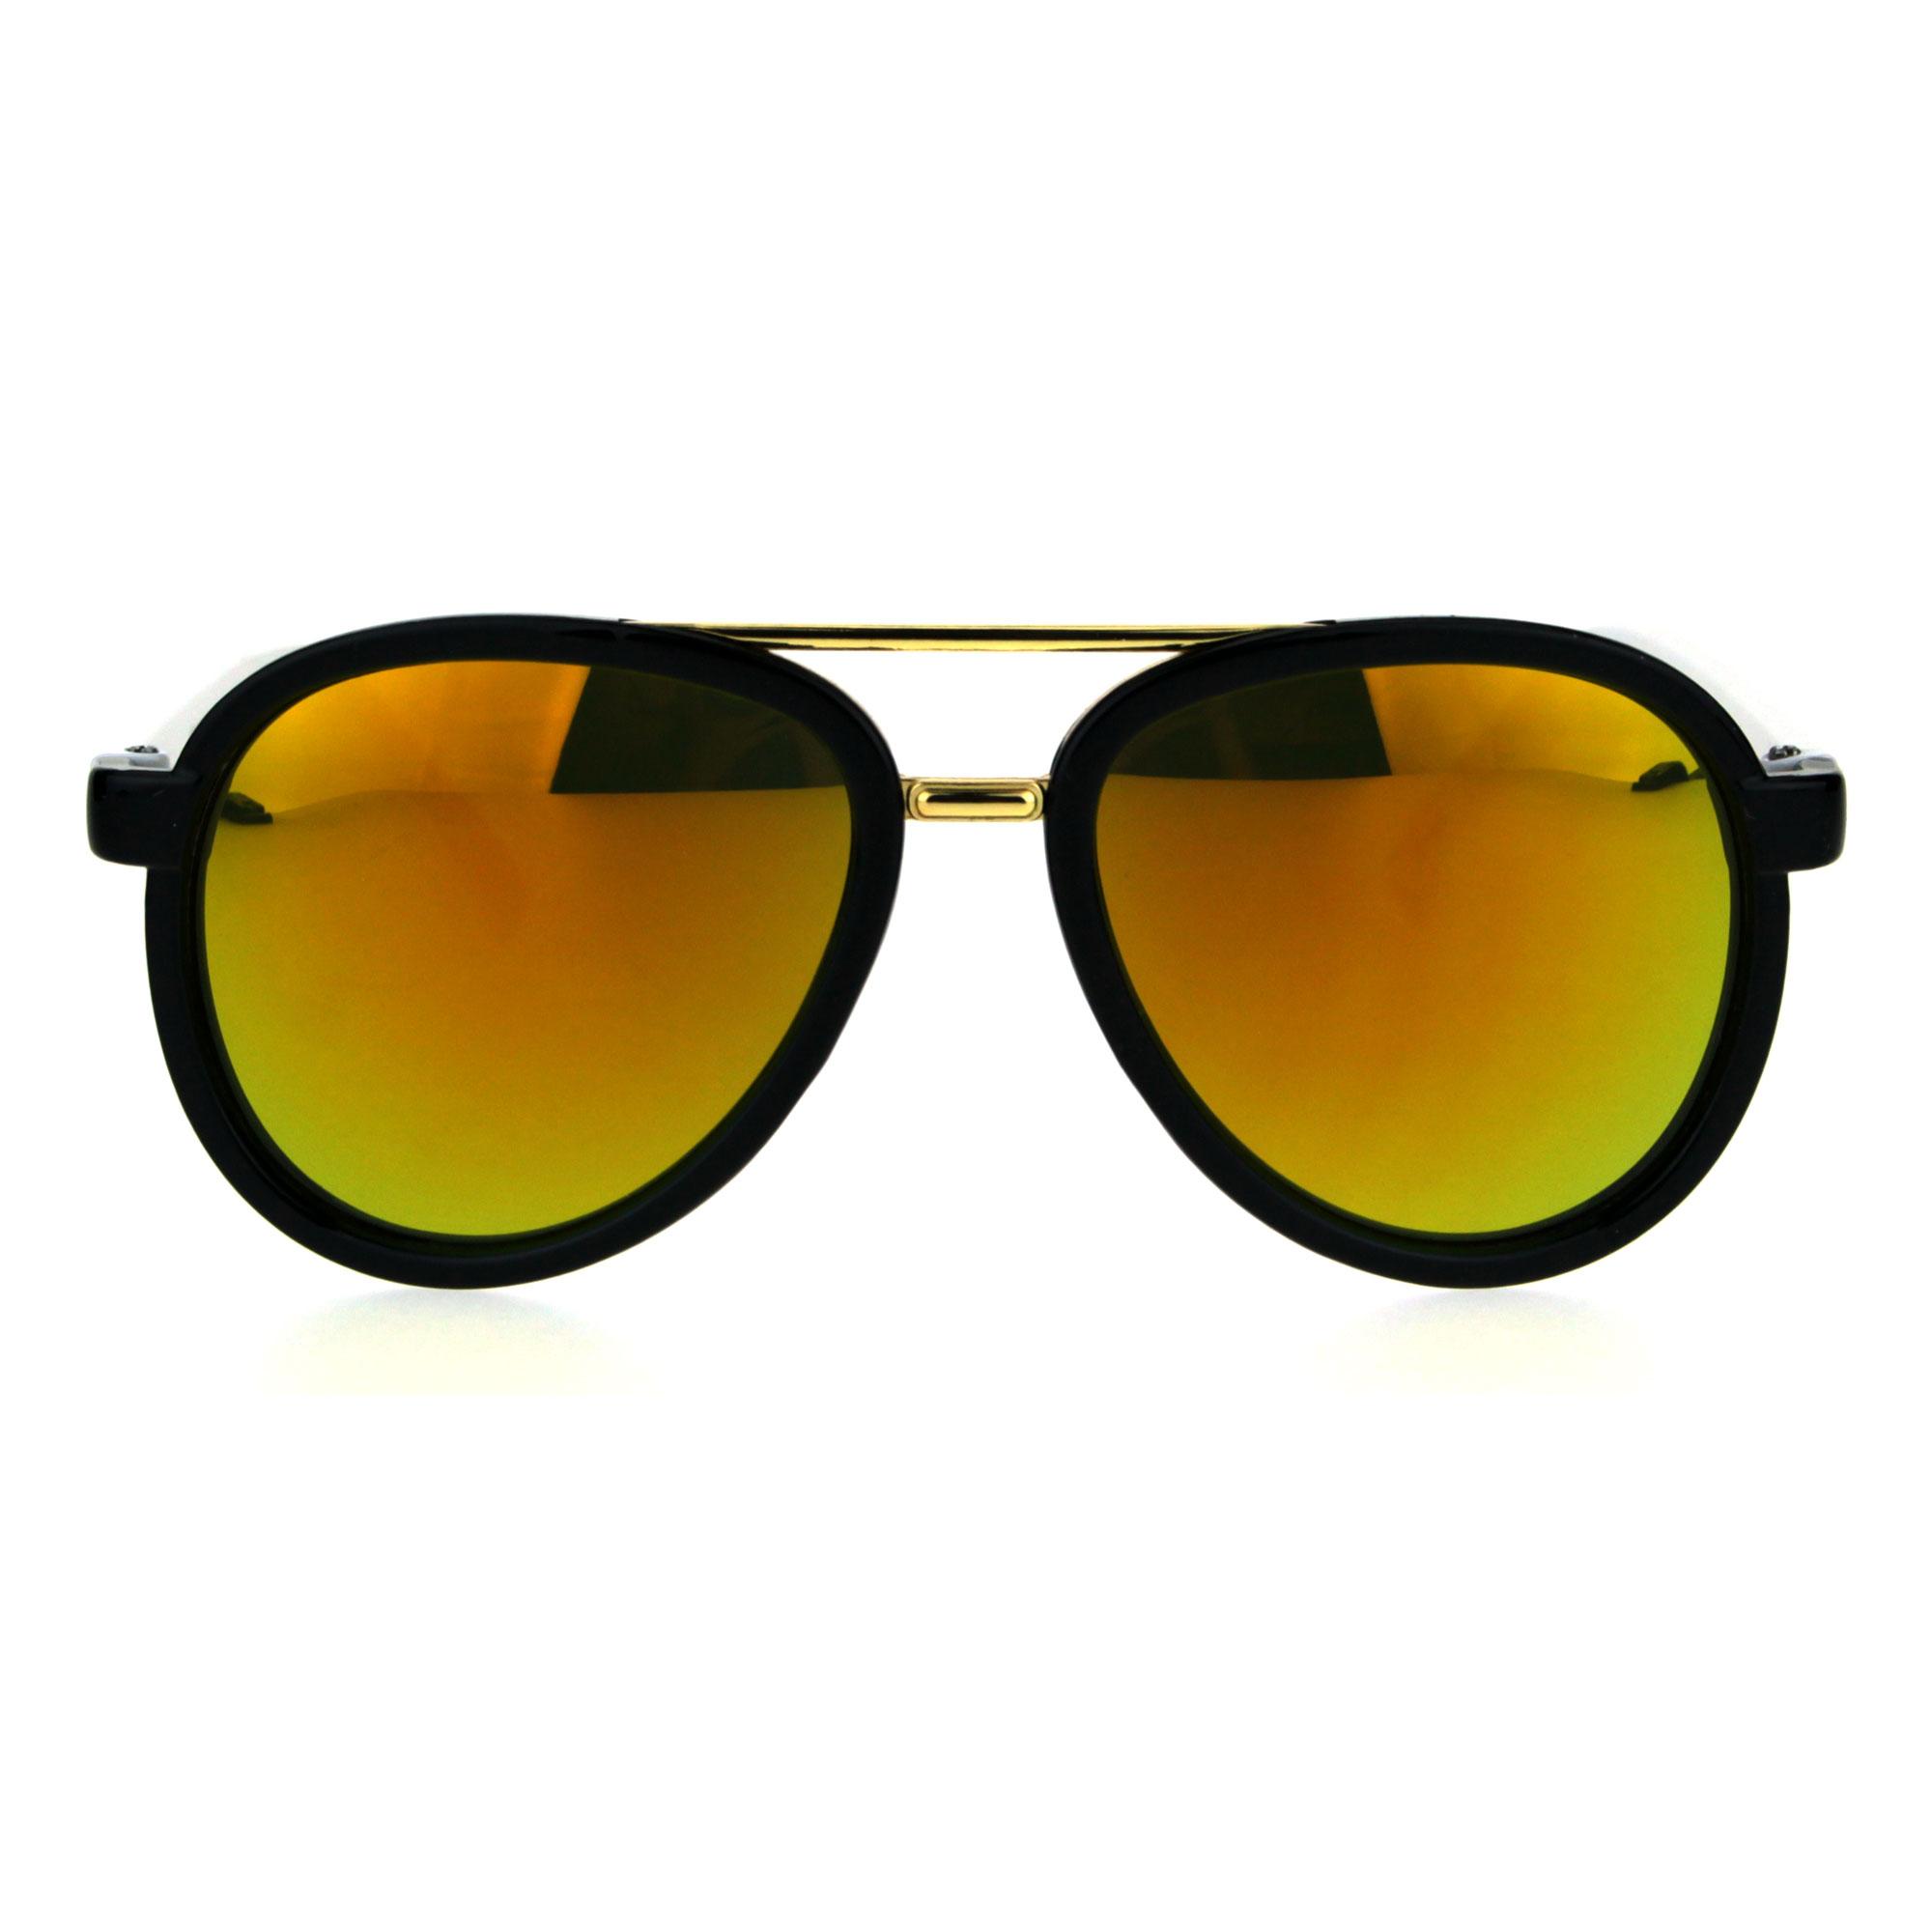 Kids Size Color Mirror Plastic Racer Aviator Sport Designer Fashion Sunglasses Black Blue